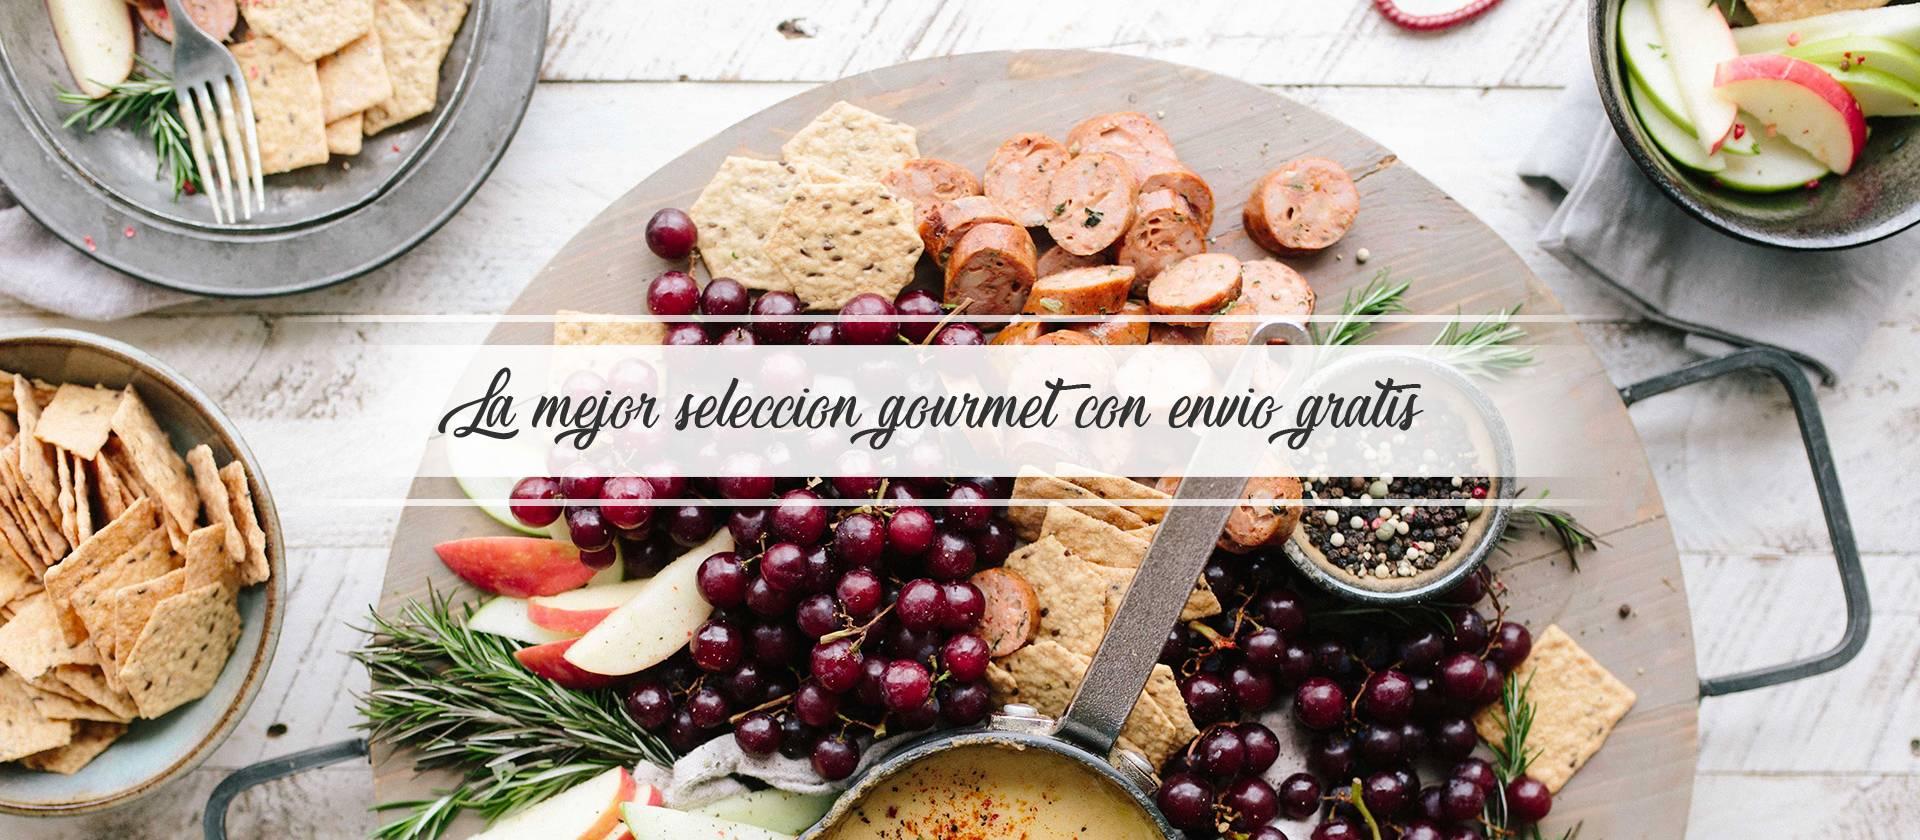 centraldelgourmet3 1 Tienda Gourmet Online | Productos Gourmet